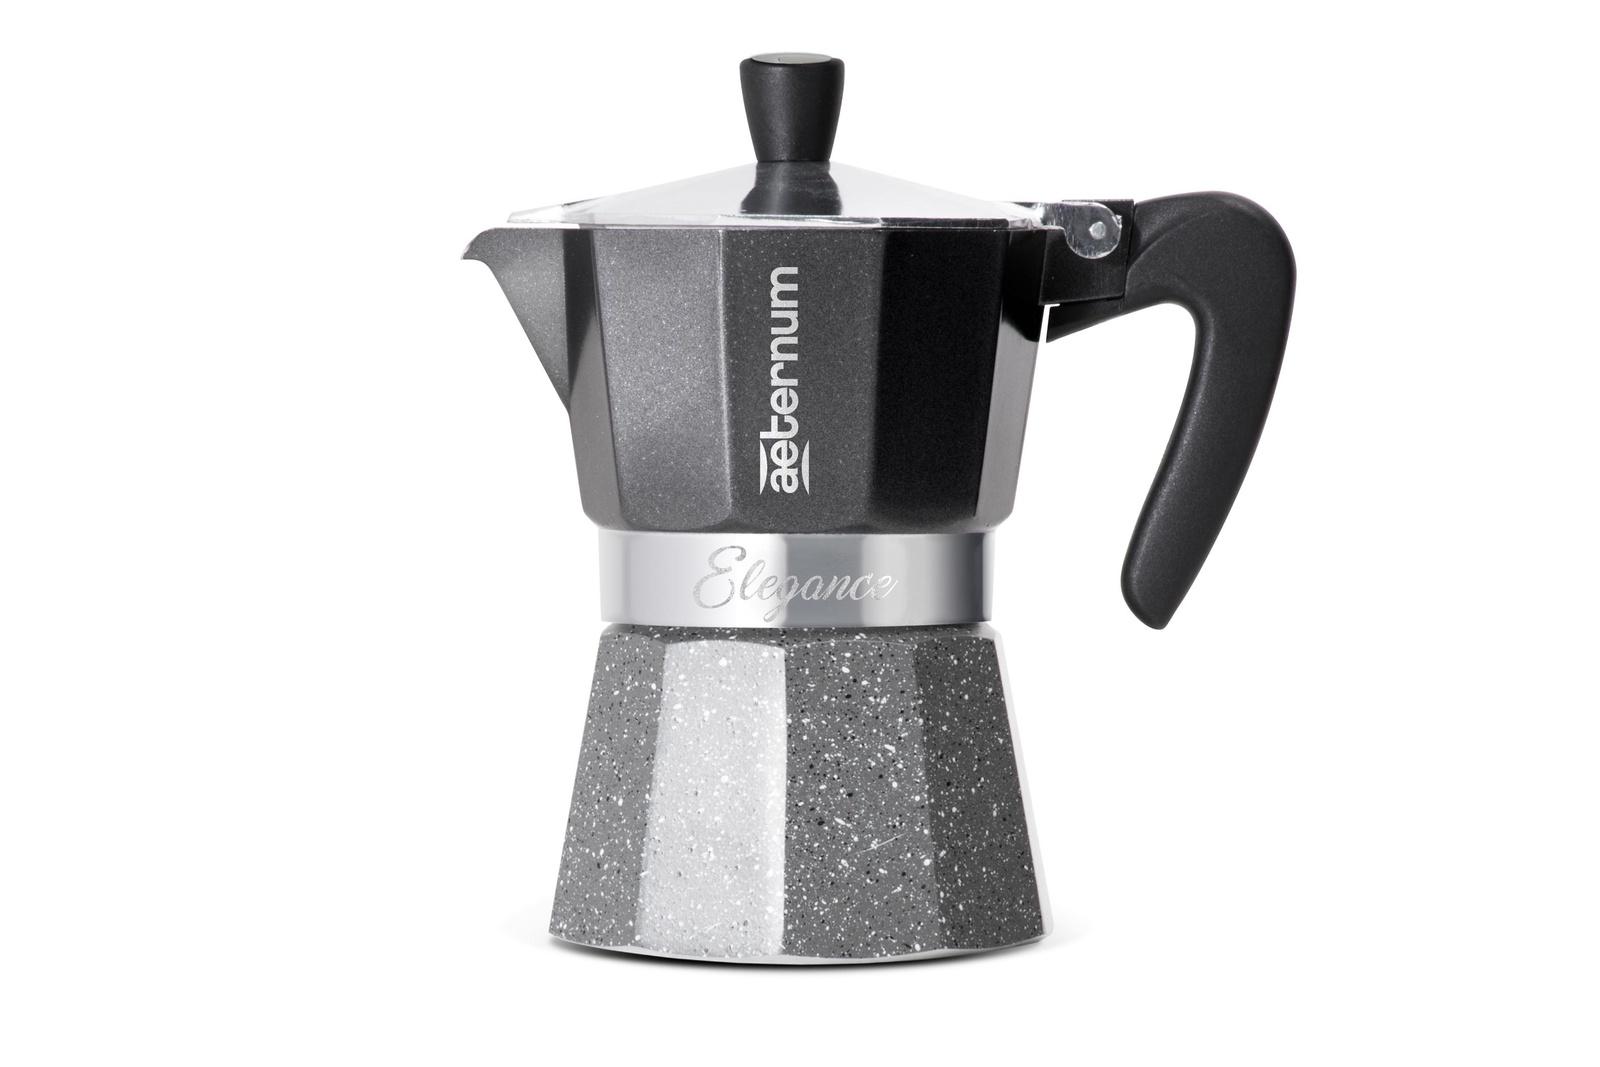 Гейзерная кофеварка Bialetti Aeternum Elegance, на 6 чашек, Алюминиевый сплав кофеварка гейзерная bialetti aeternum elegance 6 порций алюминий 6008